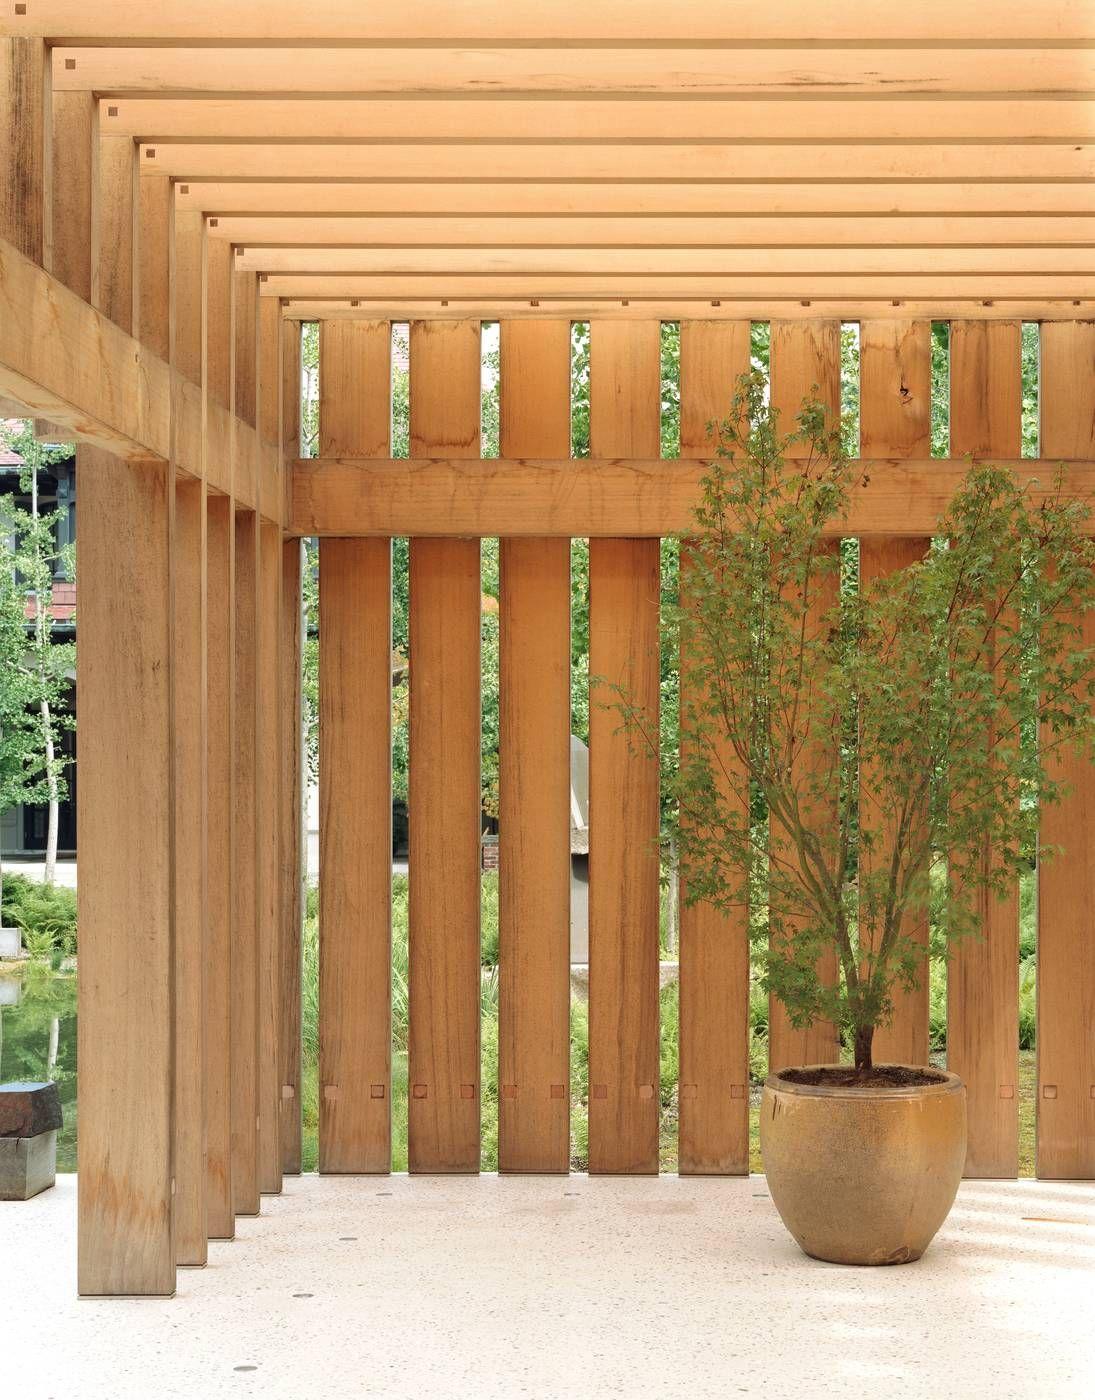 Sculpture Garden Pavilion | Gluckman Tang